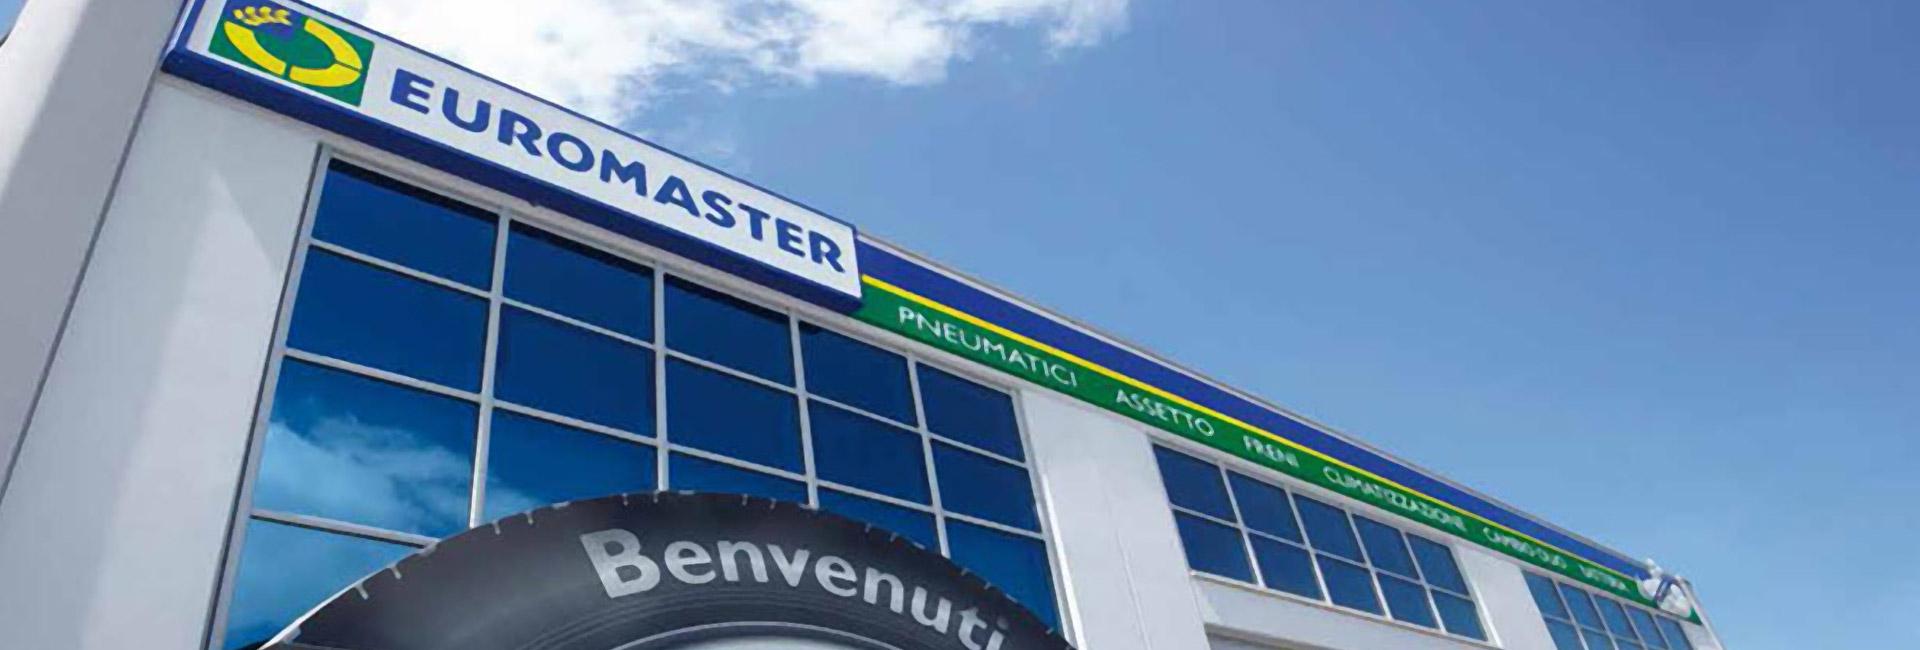 centro euromaster